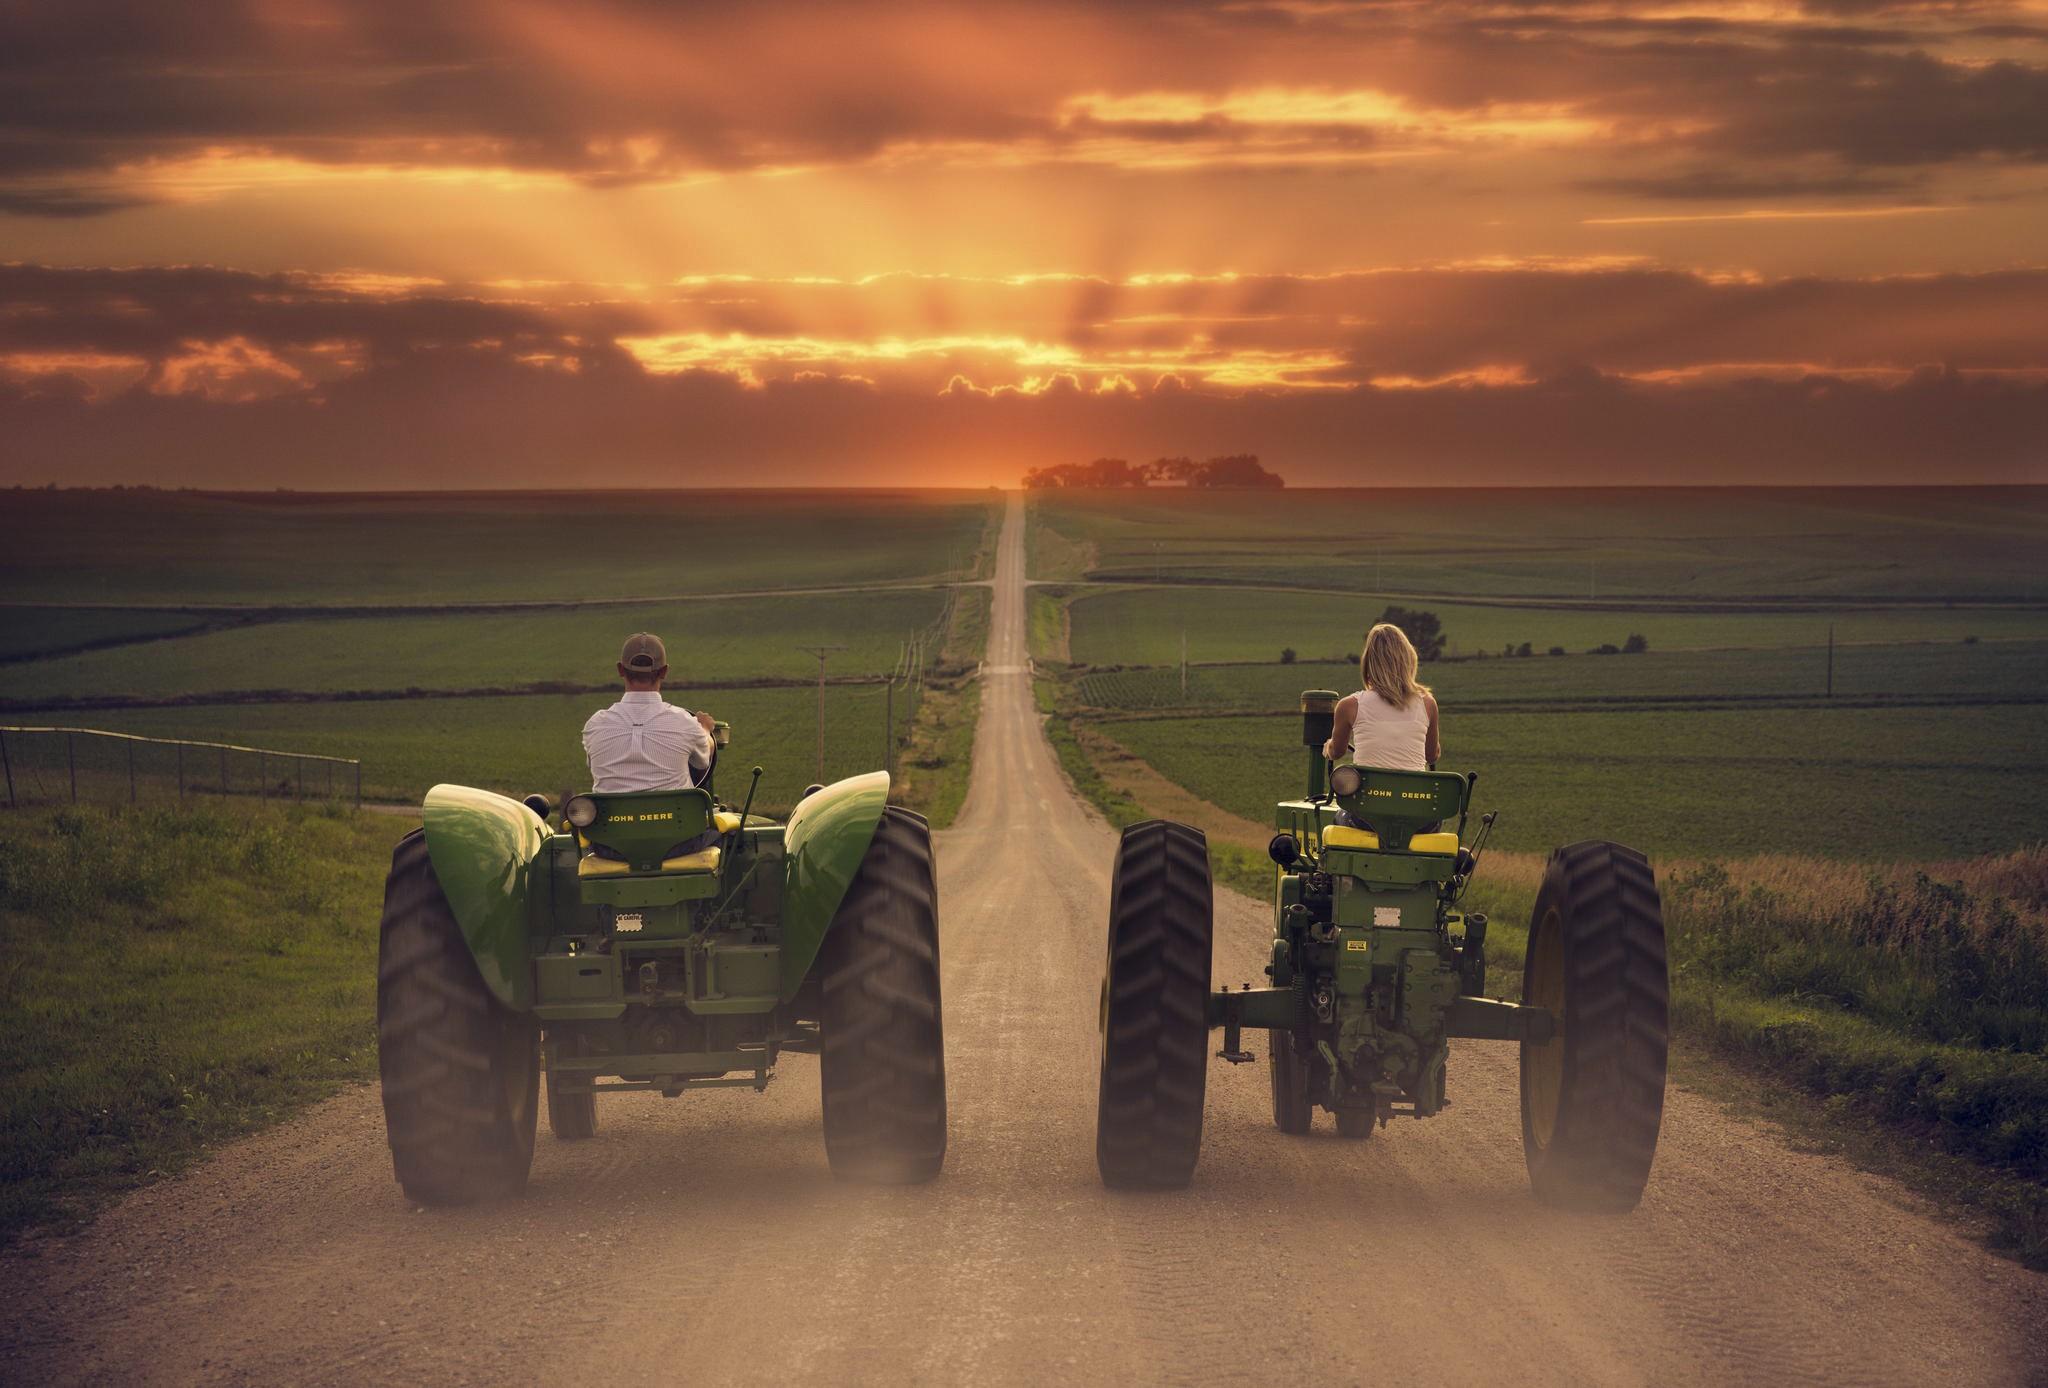 landscape vehicle field tractors